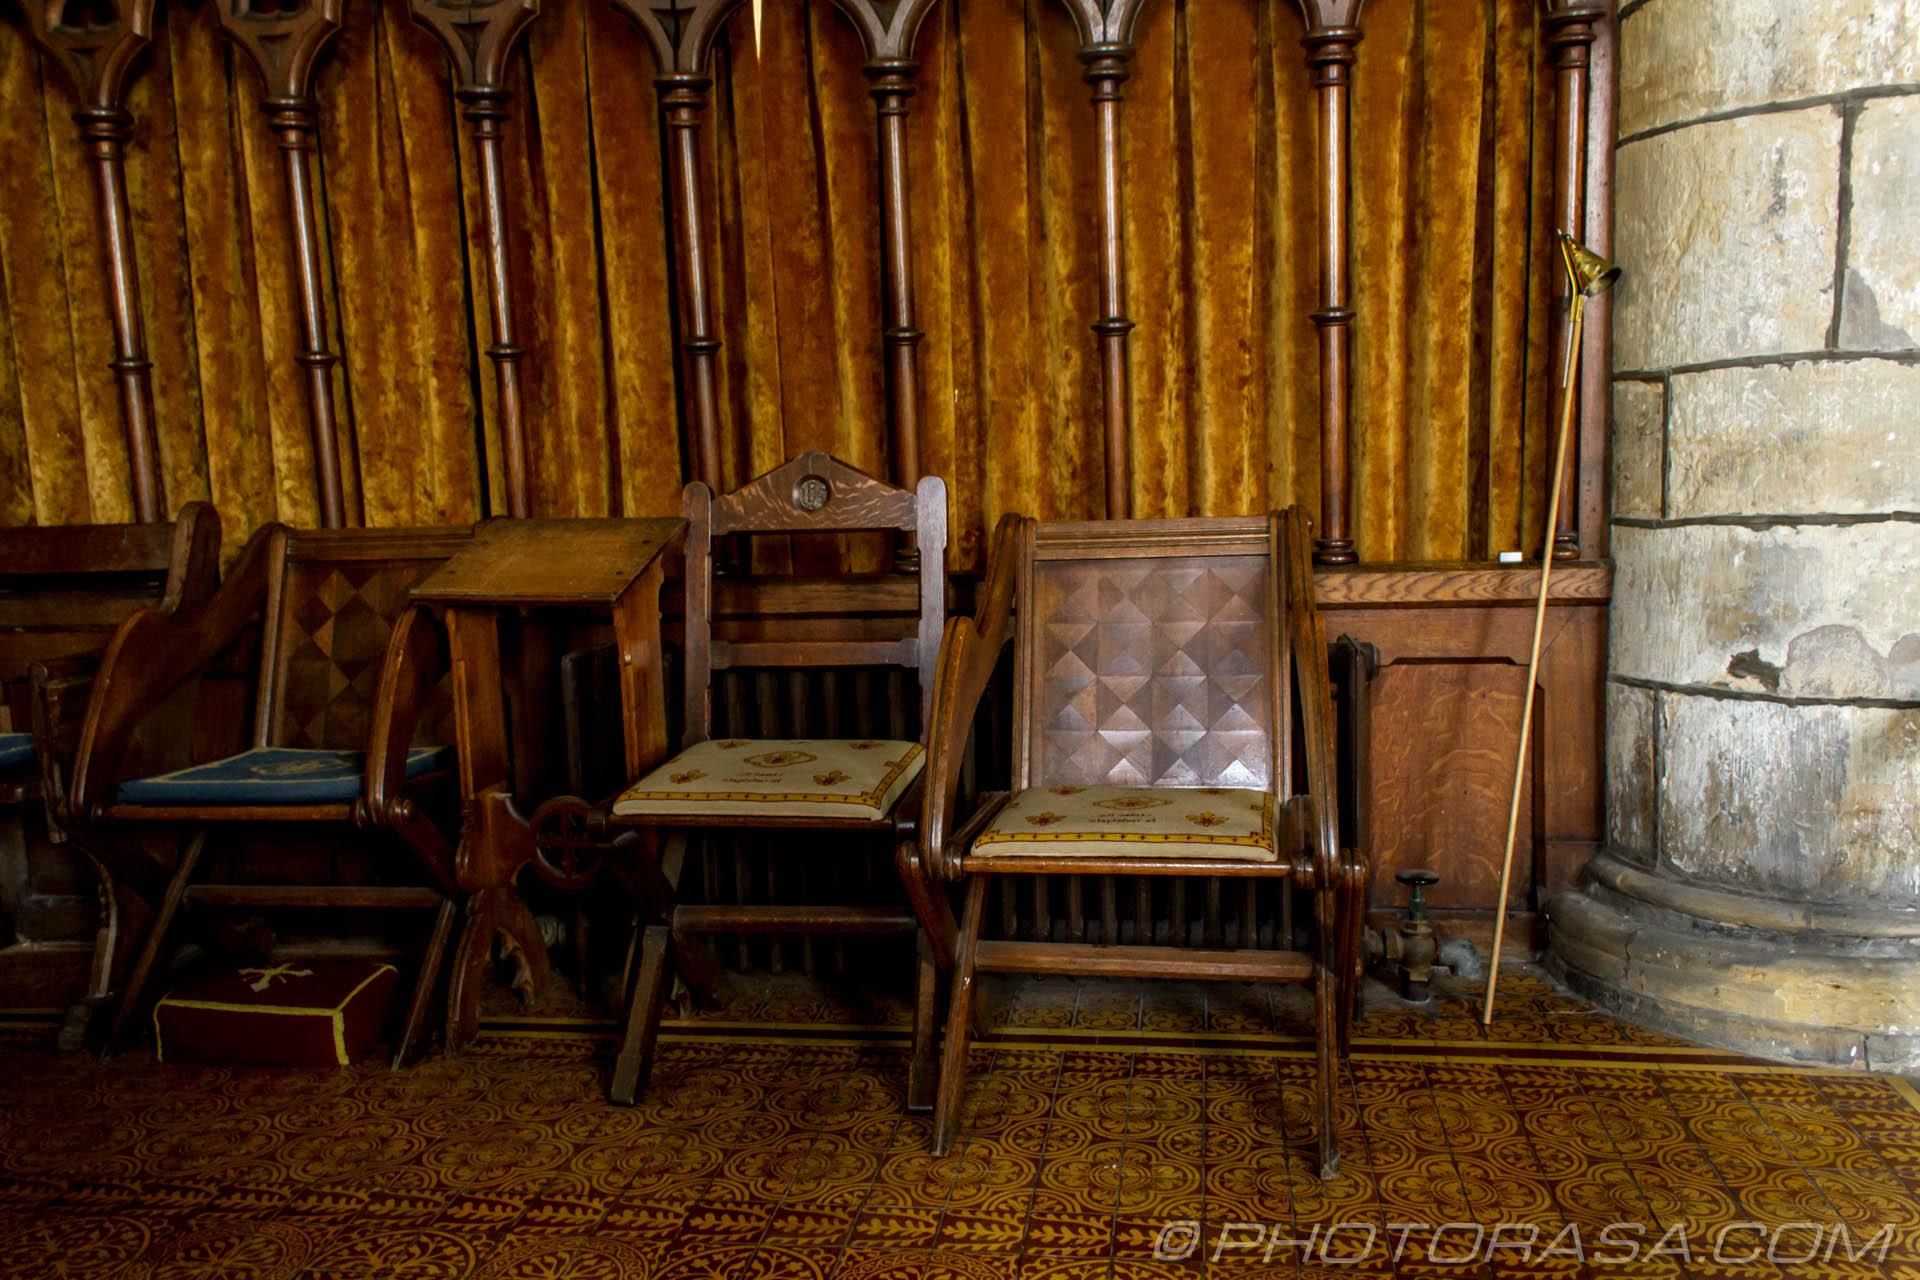 https://photorasa.com/saints-church-staplehurst-kent/wooden-chairs-and-gold-candle-snuffer/